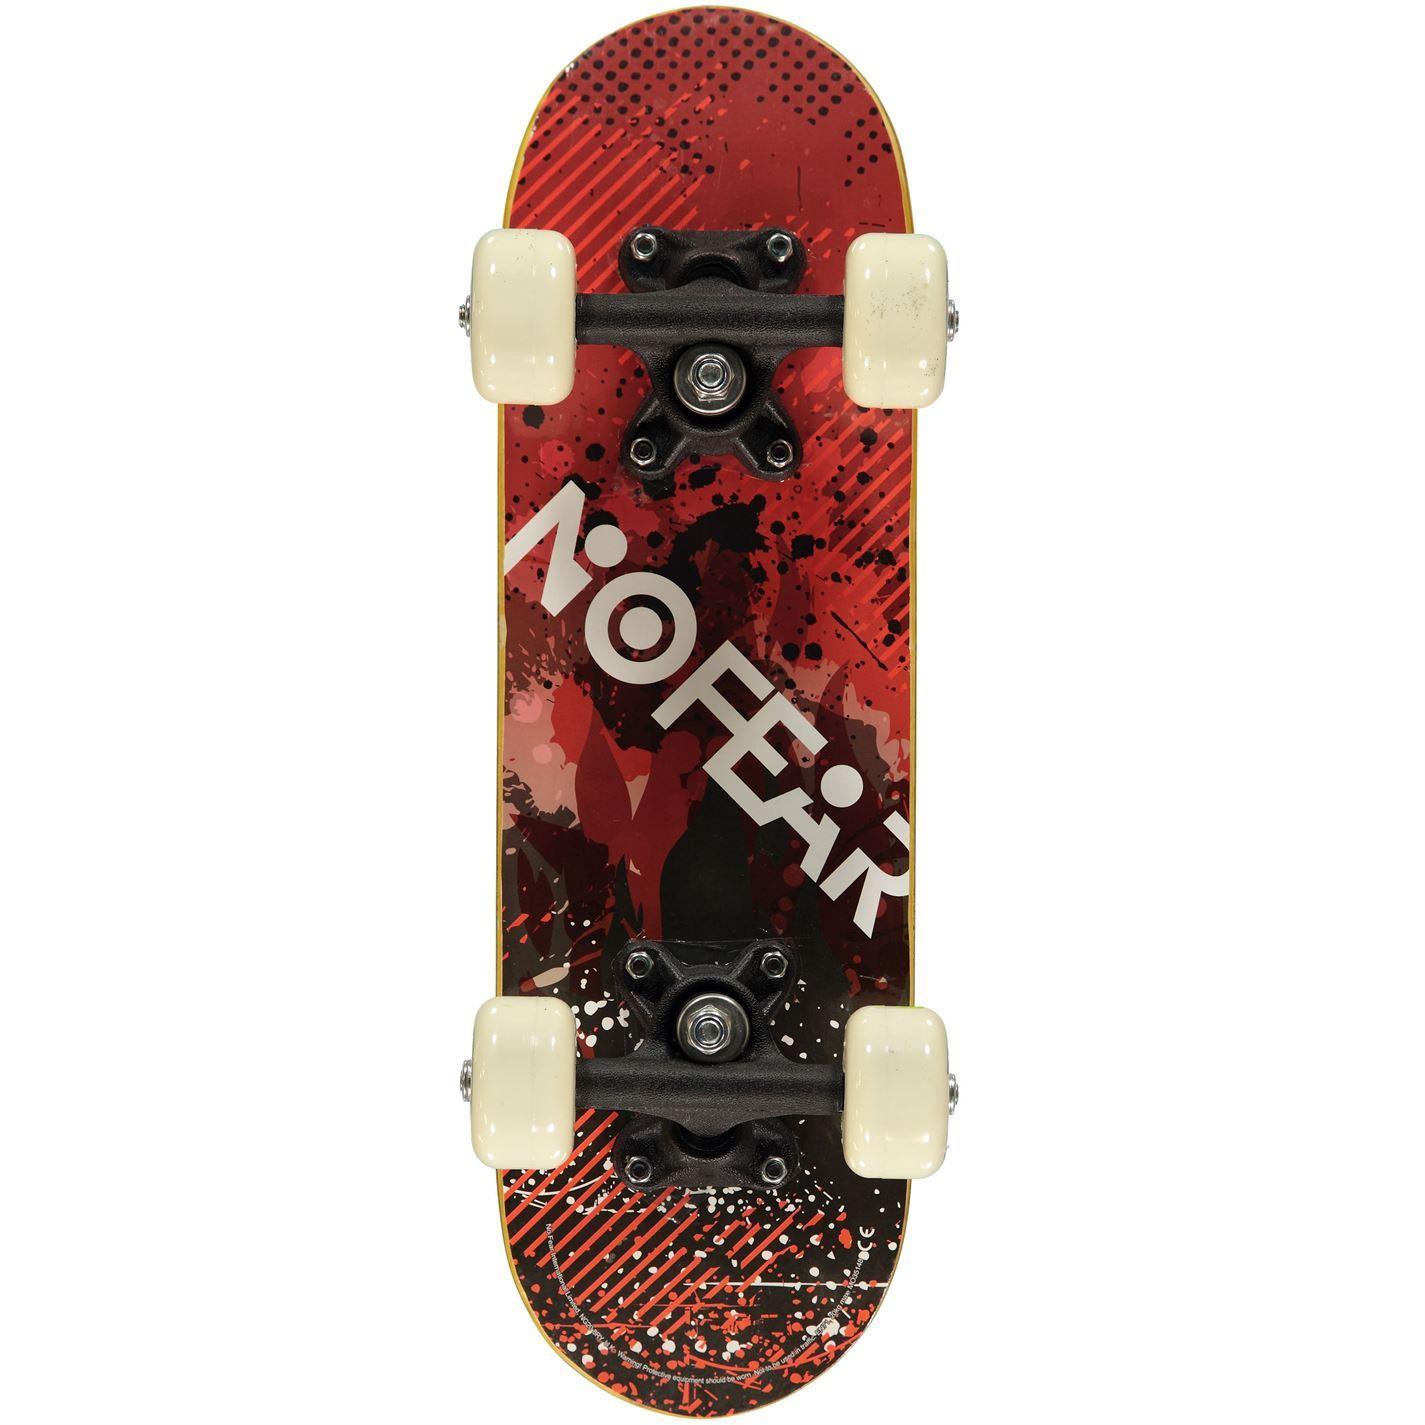 No Fear Kids Children Junior Skateboard Micro Outdoor Activity Accessory